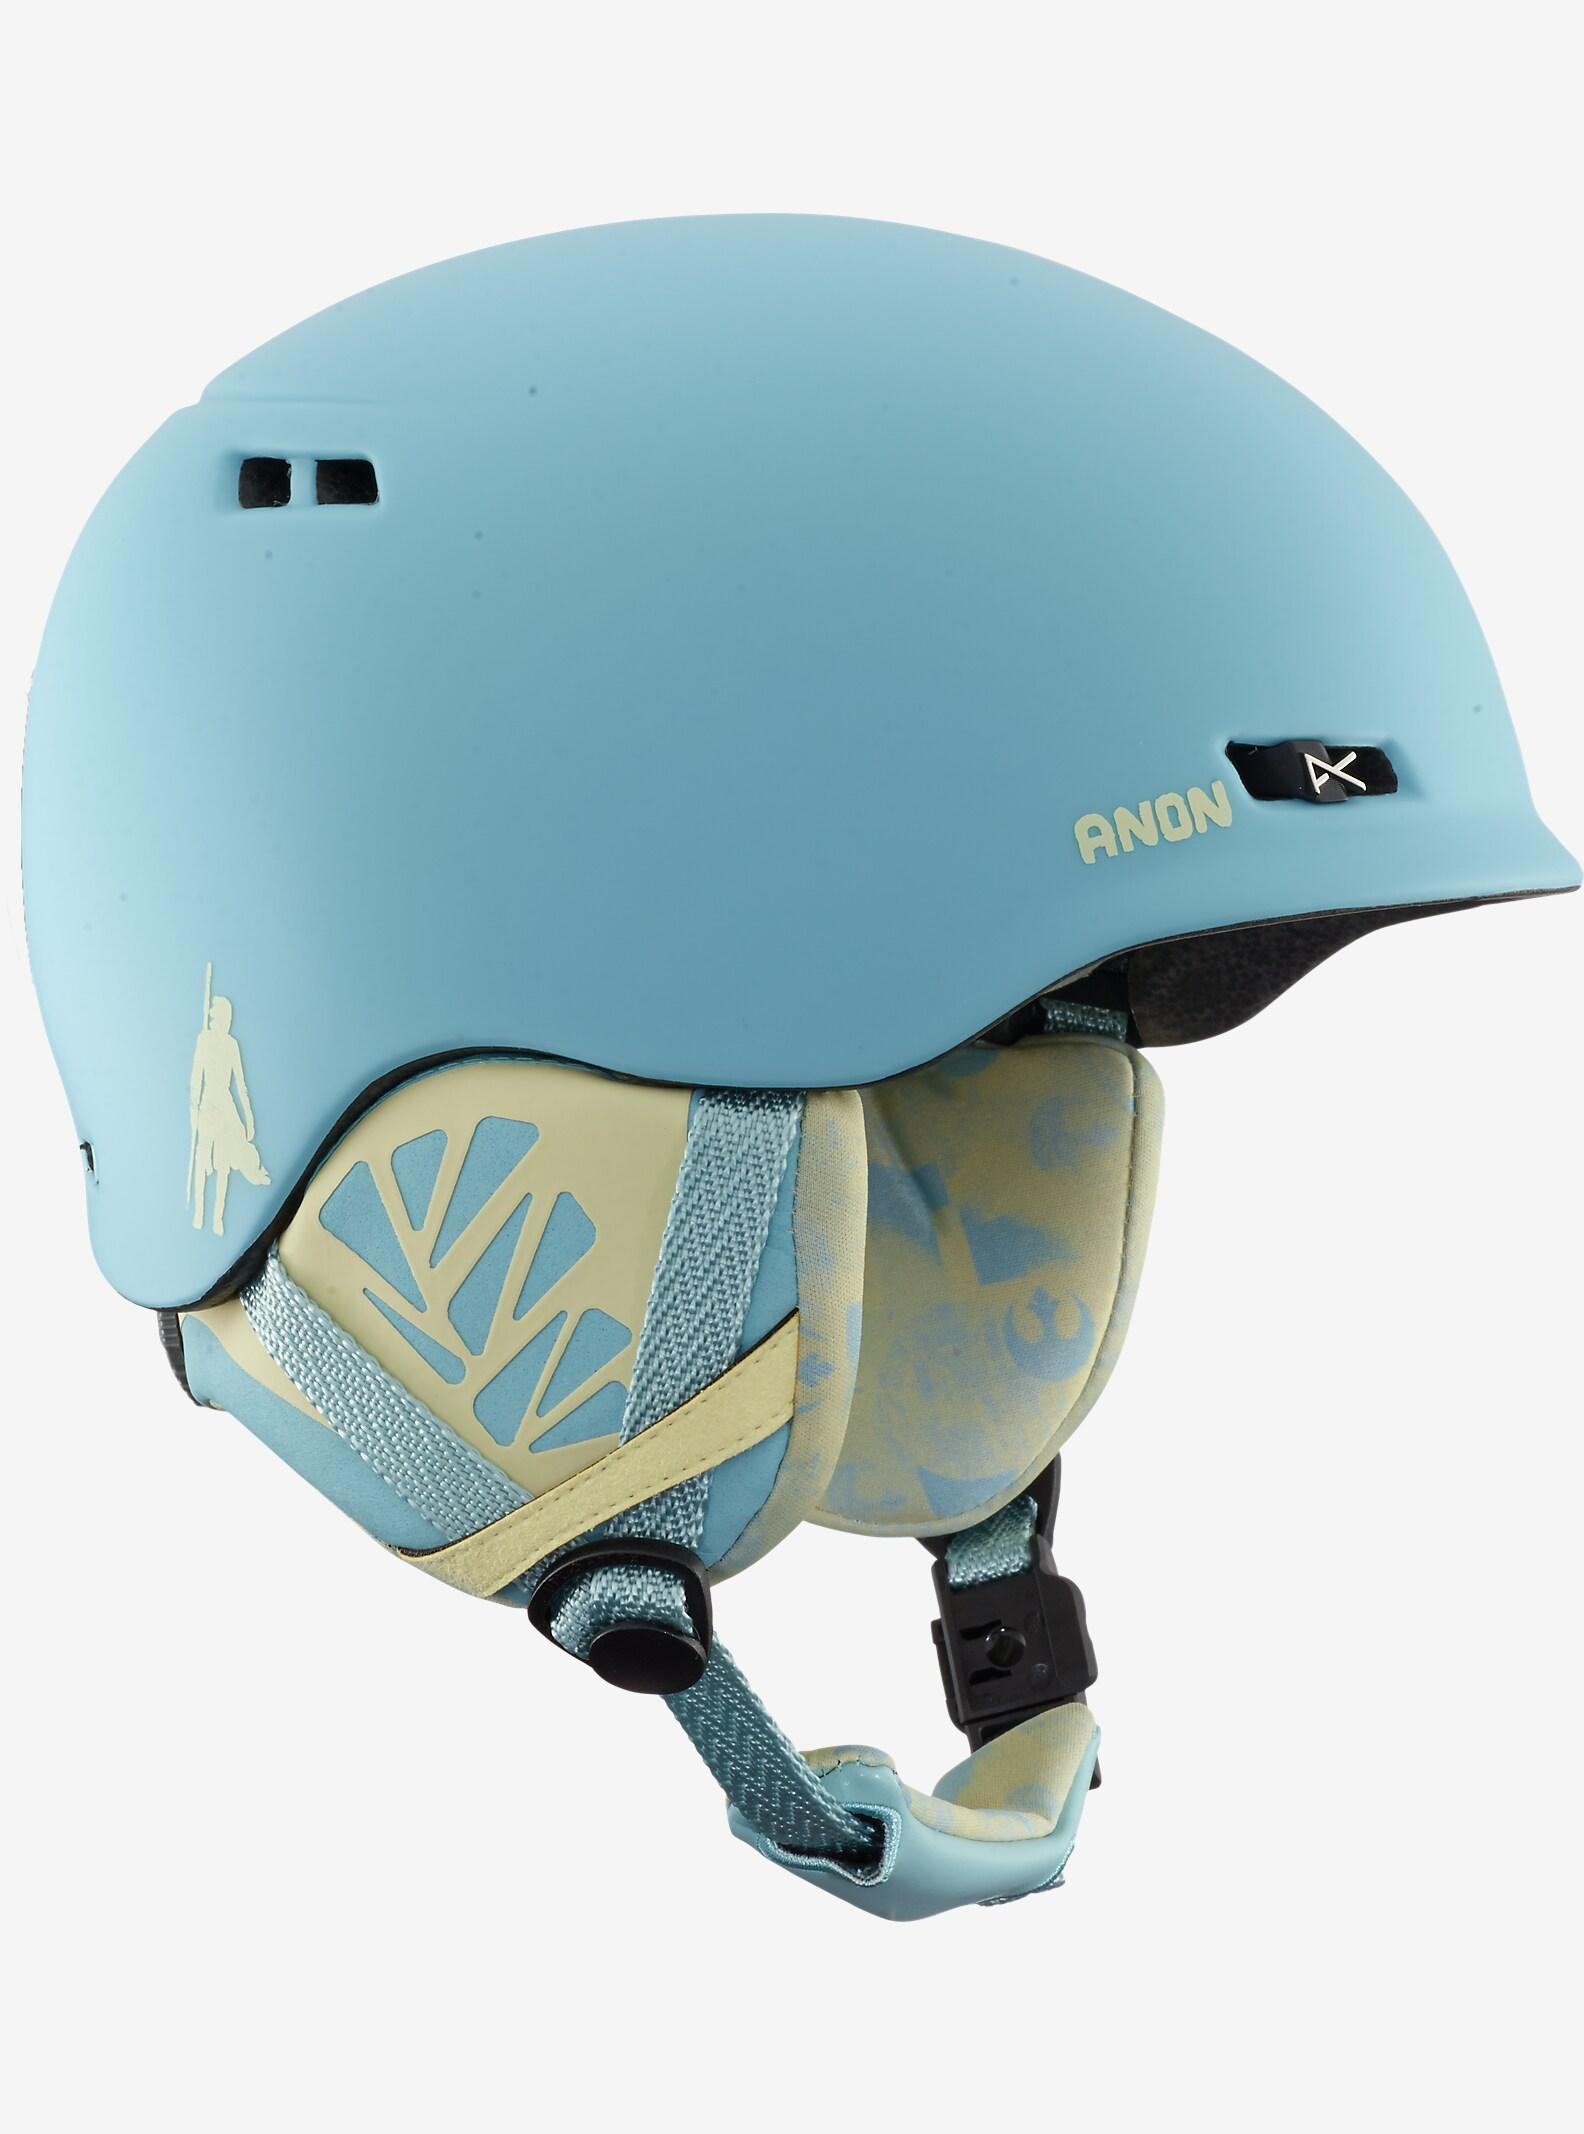 Star Wars anon. Griffon Helmet shown in Rey